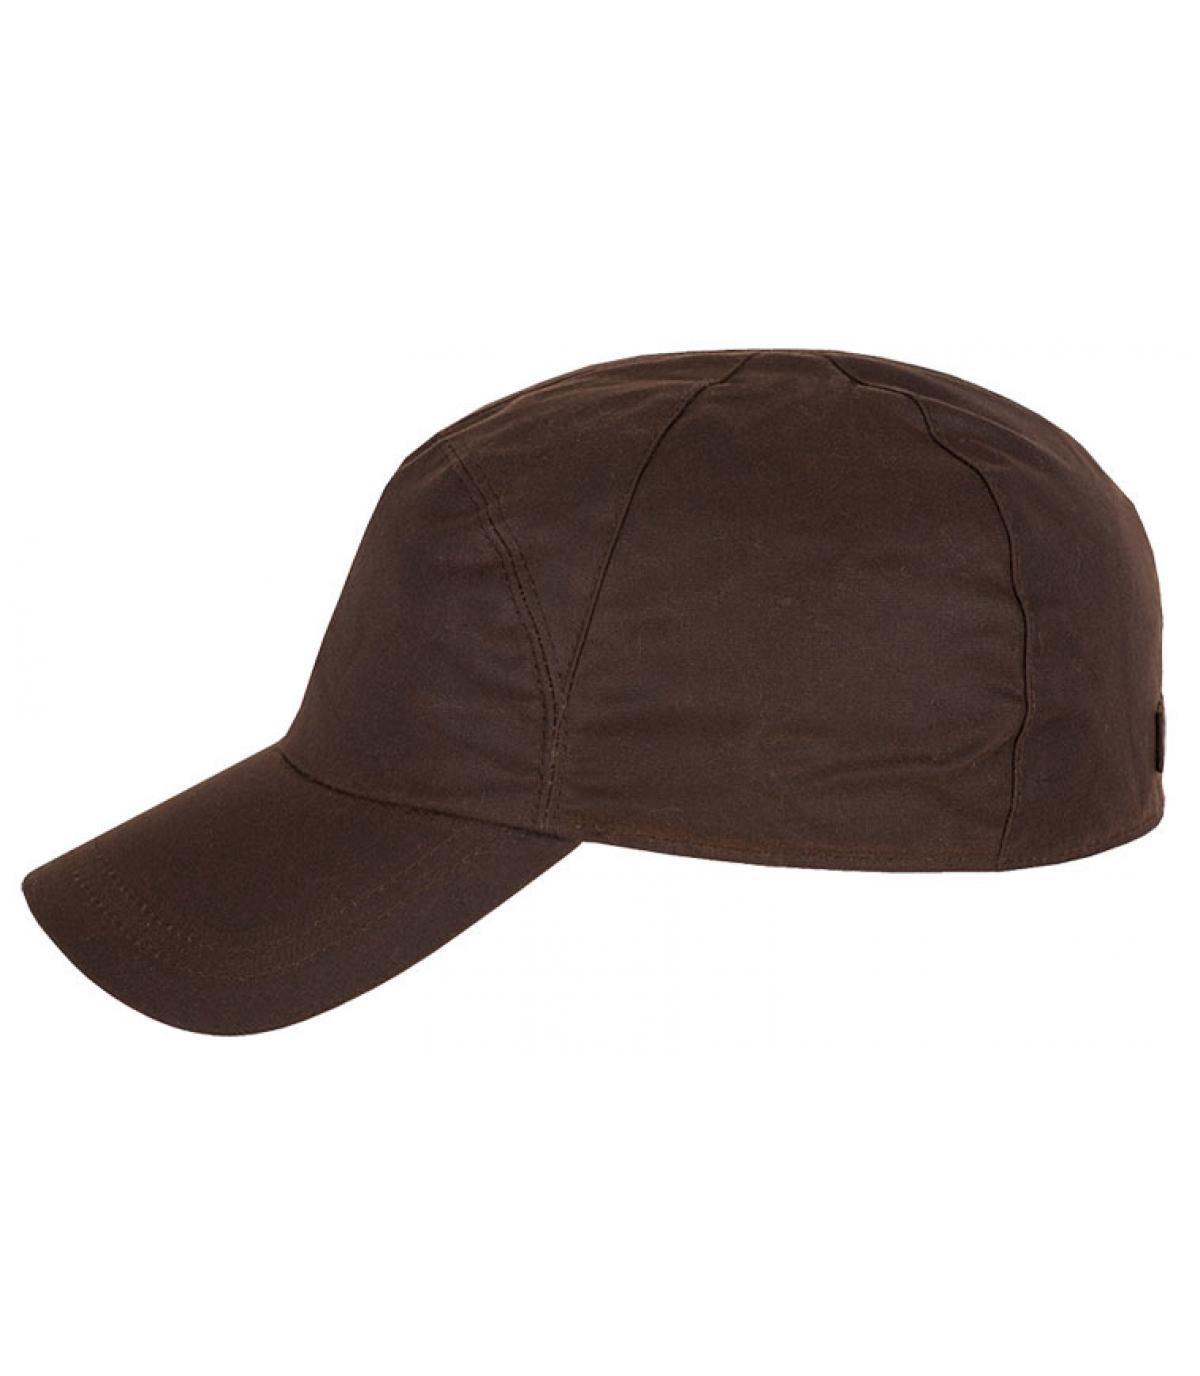 Maryman cap stetson